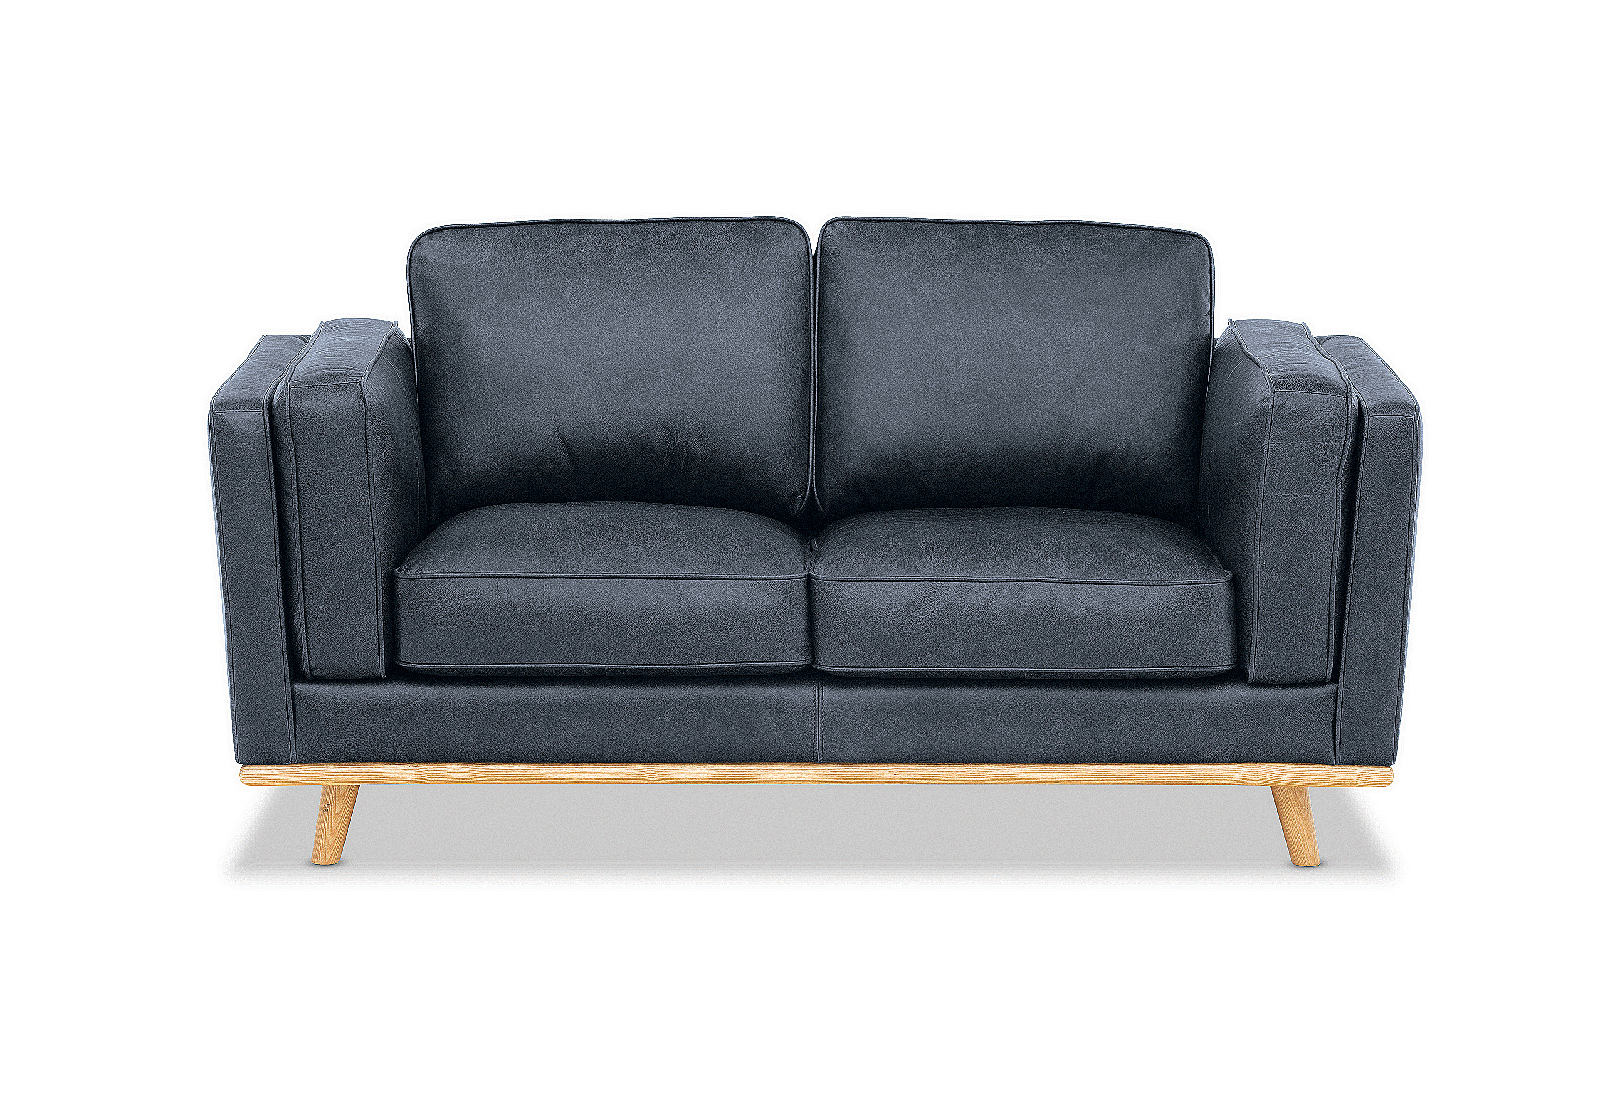 Amart Furniture With Dream Navy 2 Piece Modular Sofas (View 13 of 15)